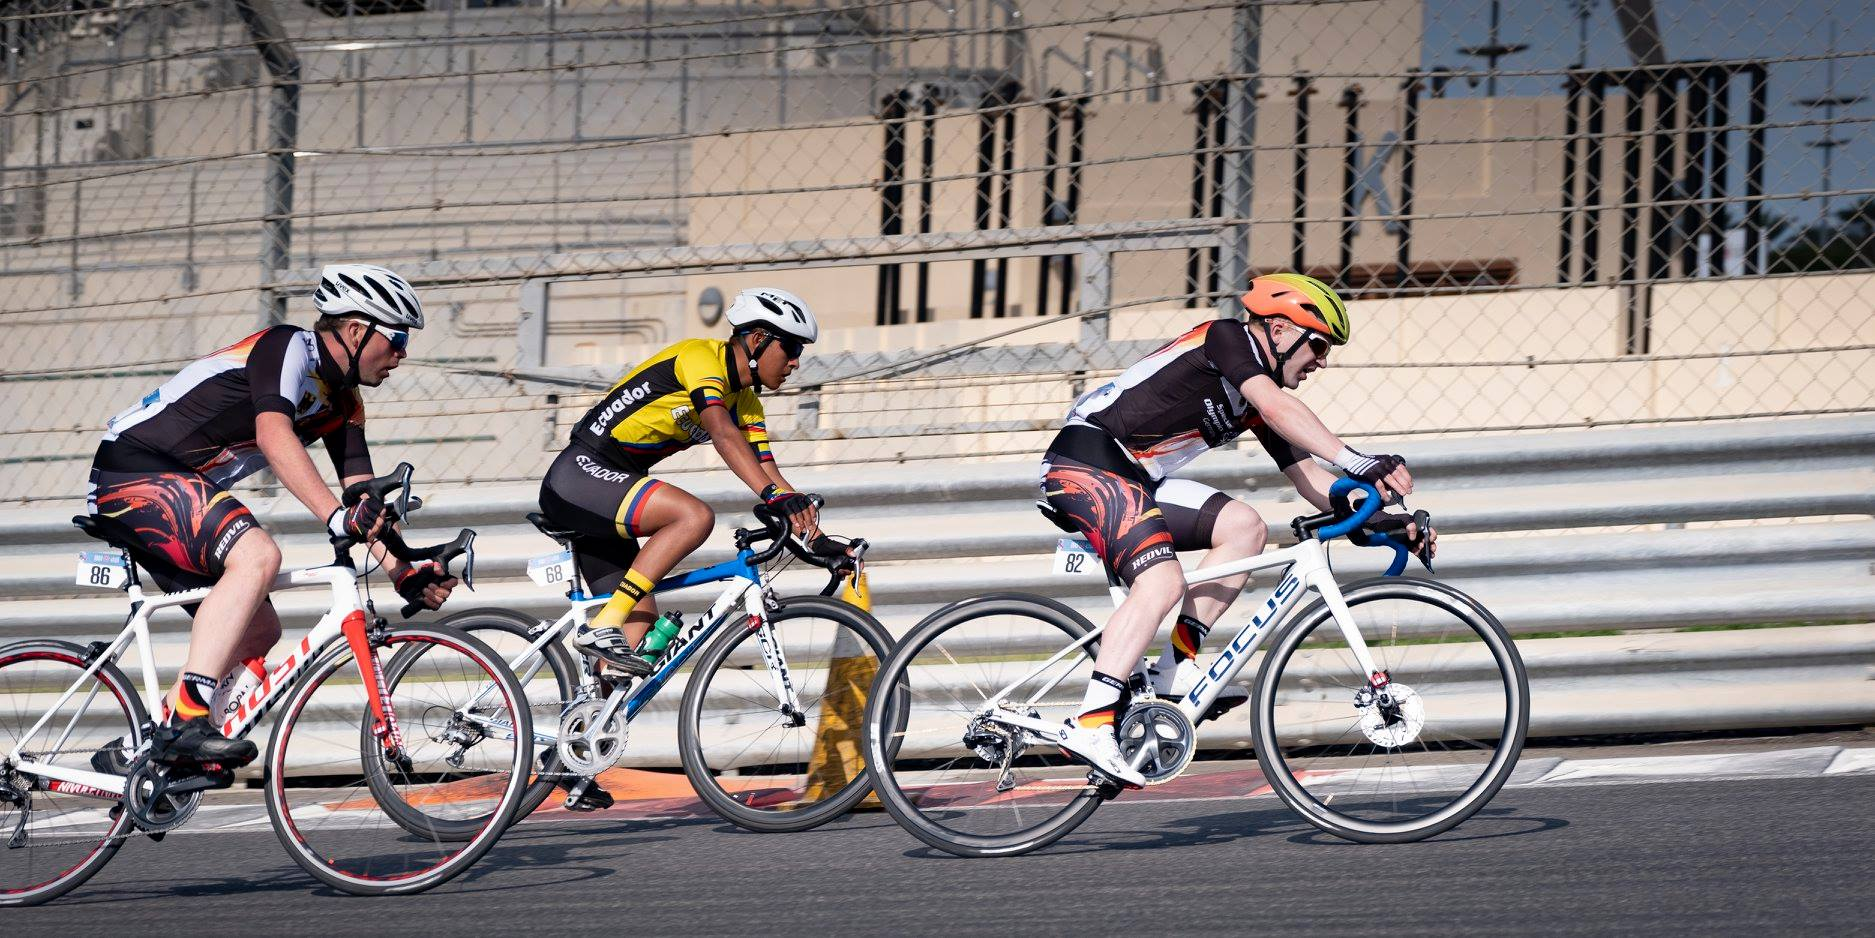 Day 6 - Yas Marina Circuit